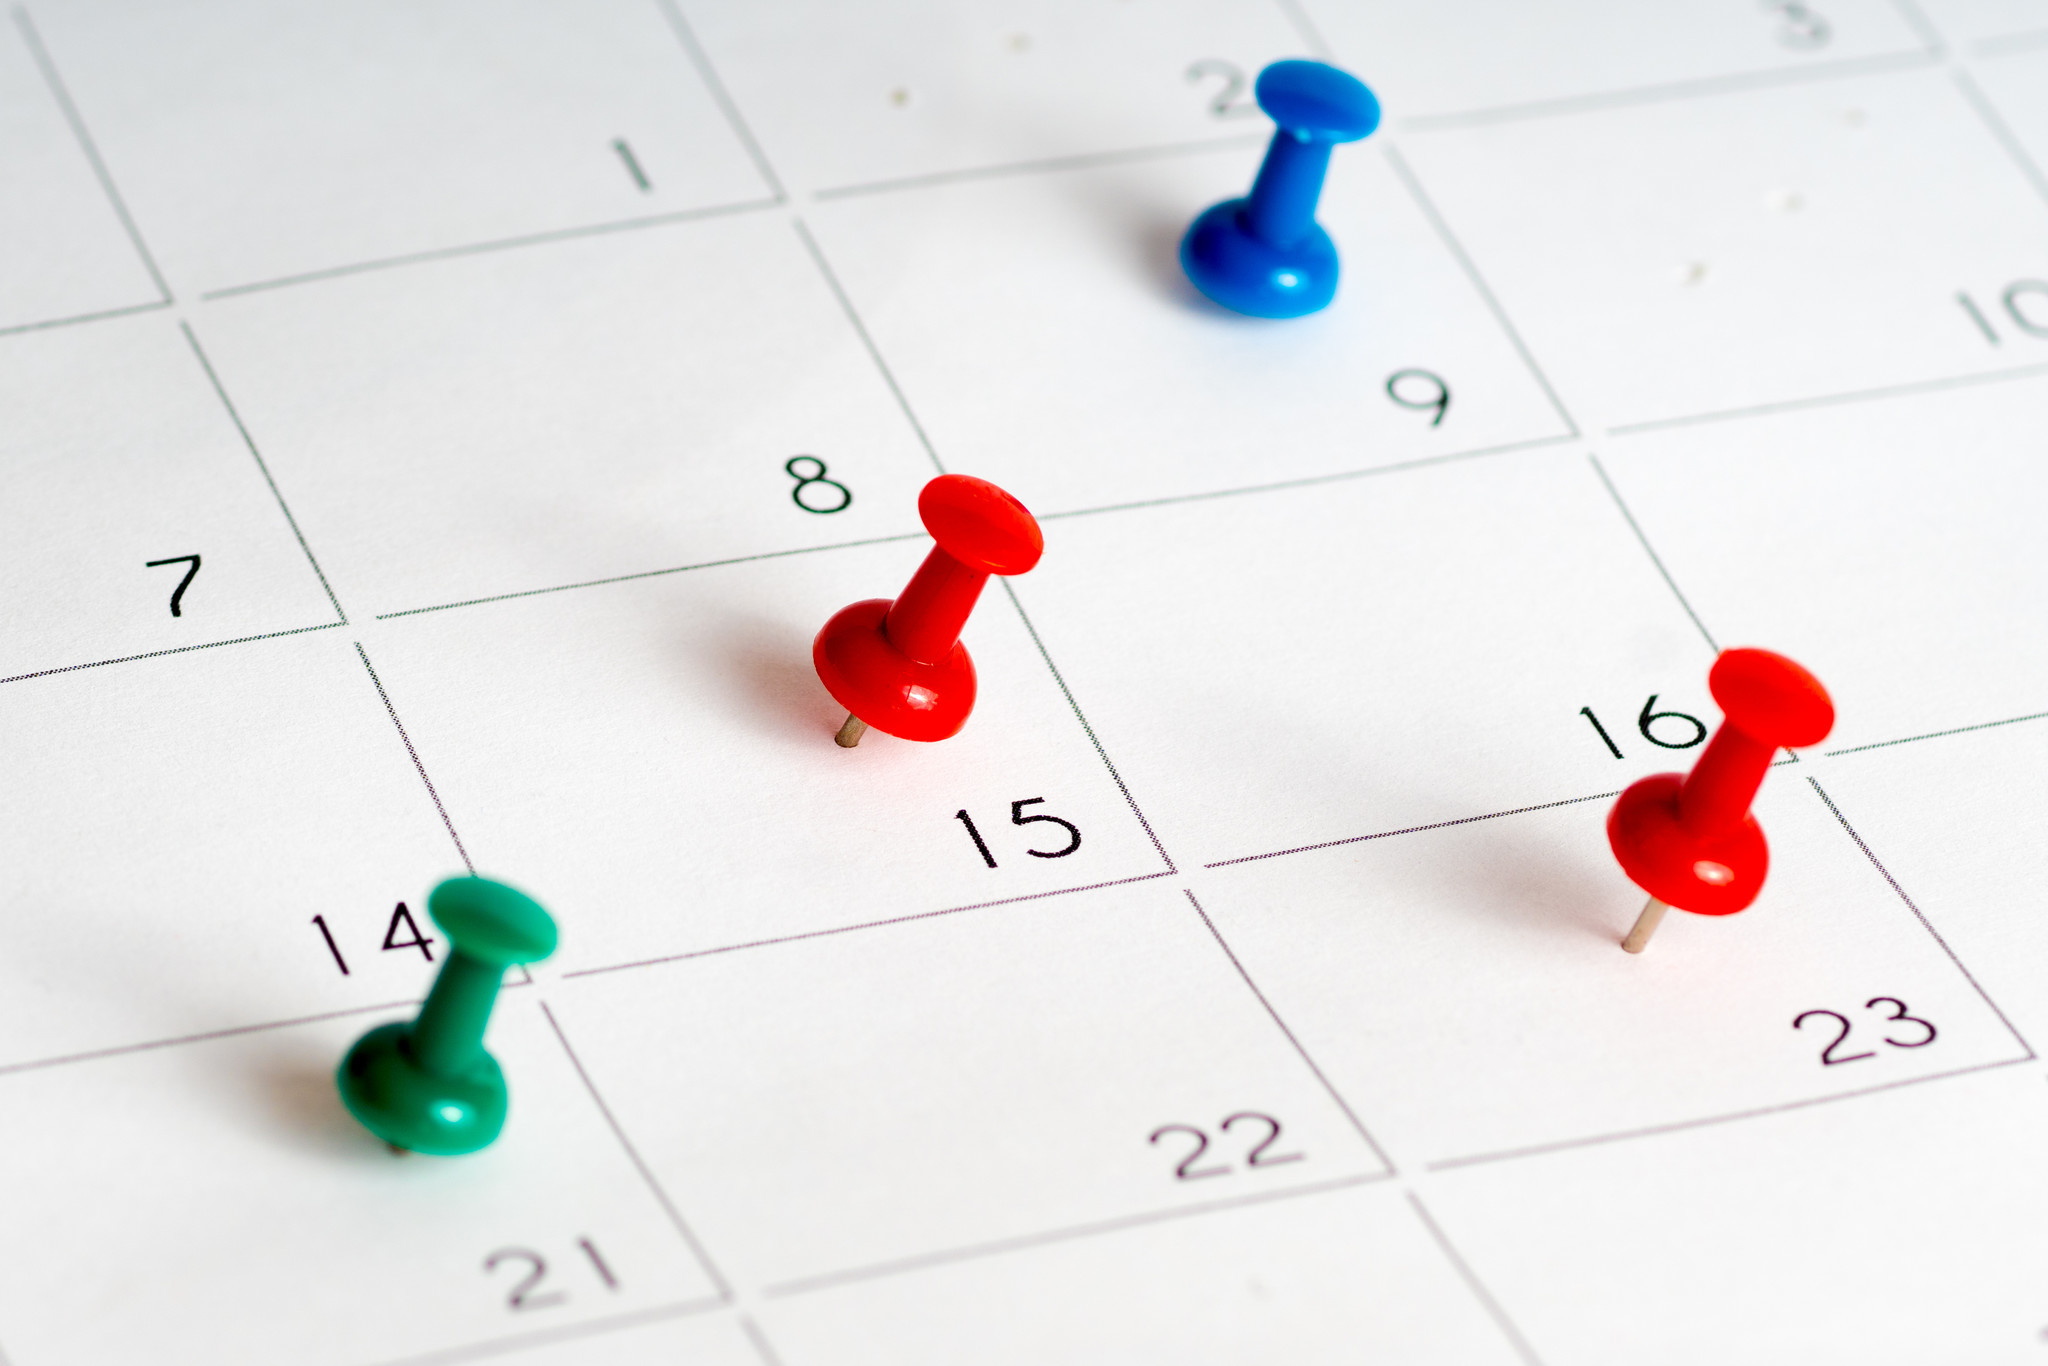 Boynton Beach area events: Feb. 27-March 2